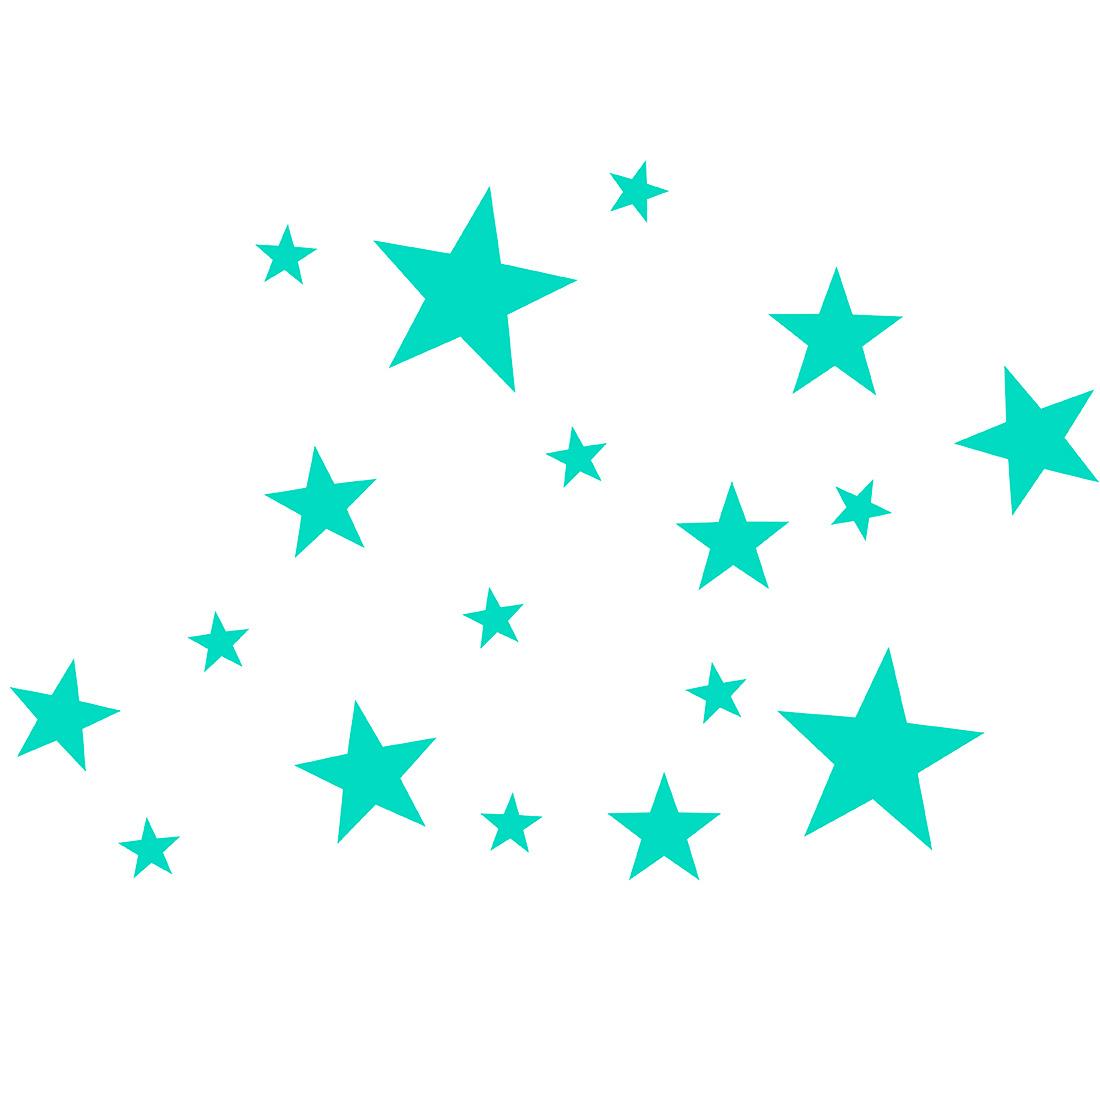 Vinilos decorativos mini estrellas mix decoraci n - Estrellas decoracion infantil ...